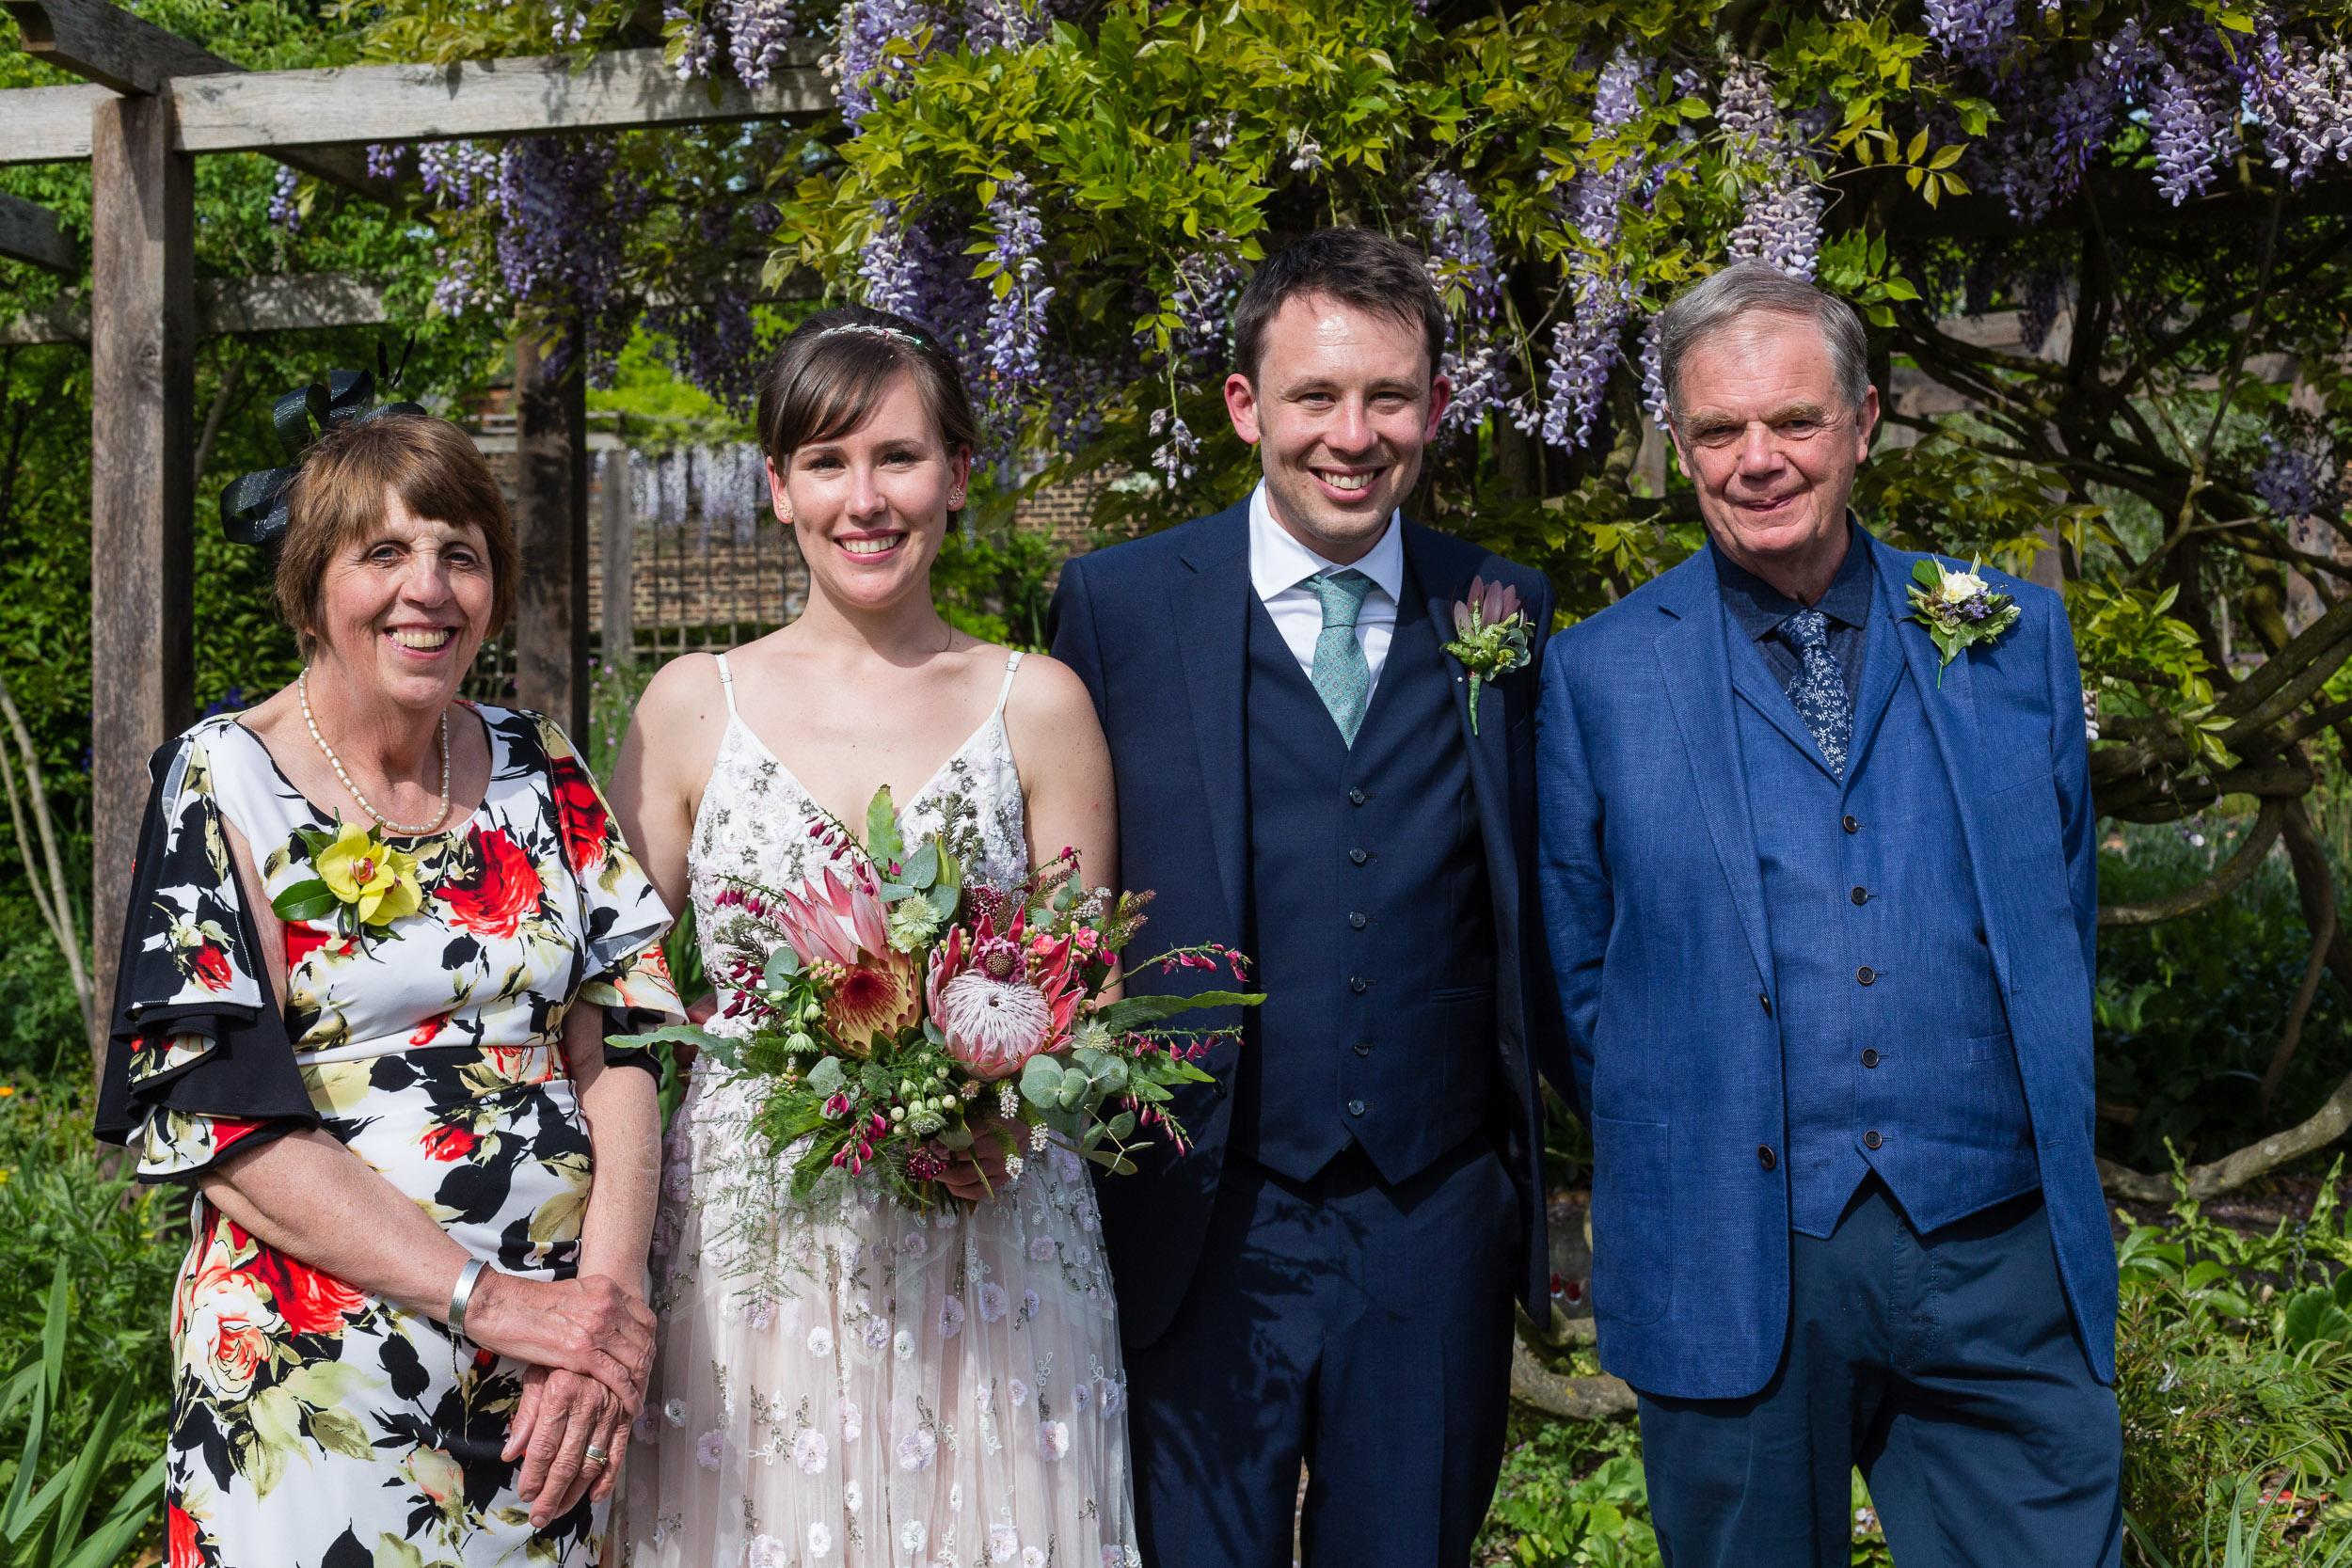 brockwell-lido-brixton-herne-hill-wedding-265.jpg